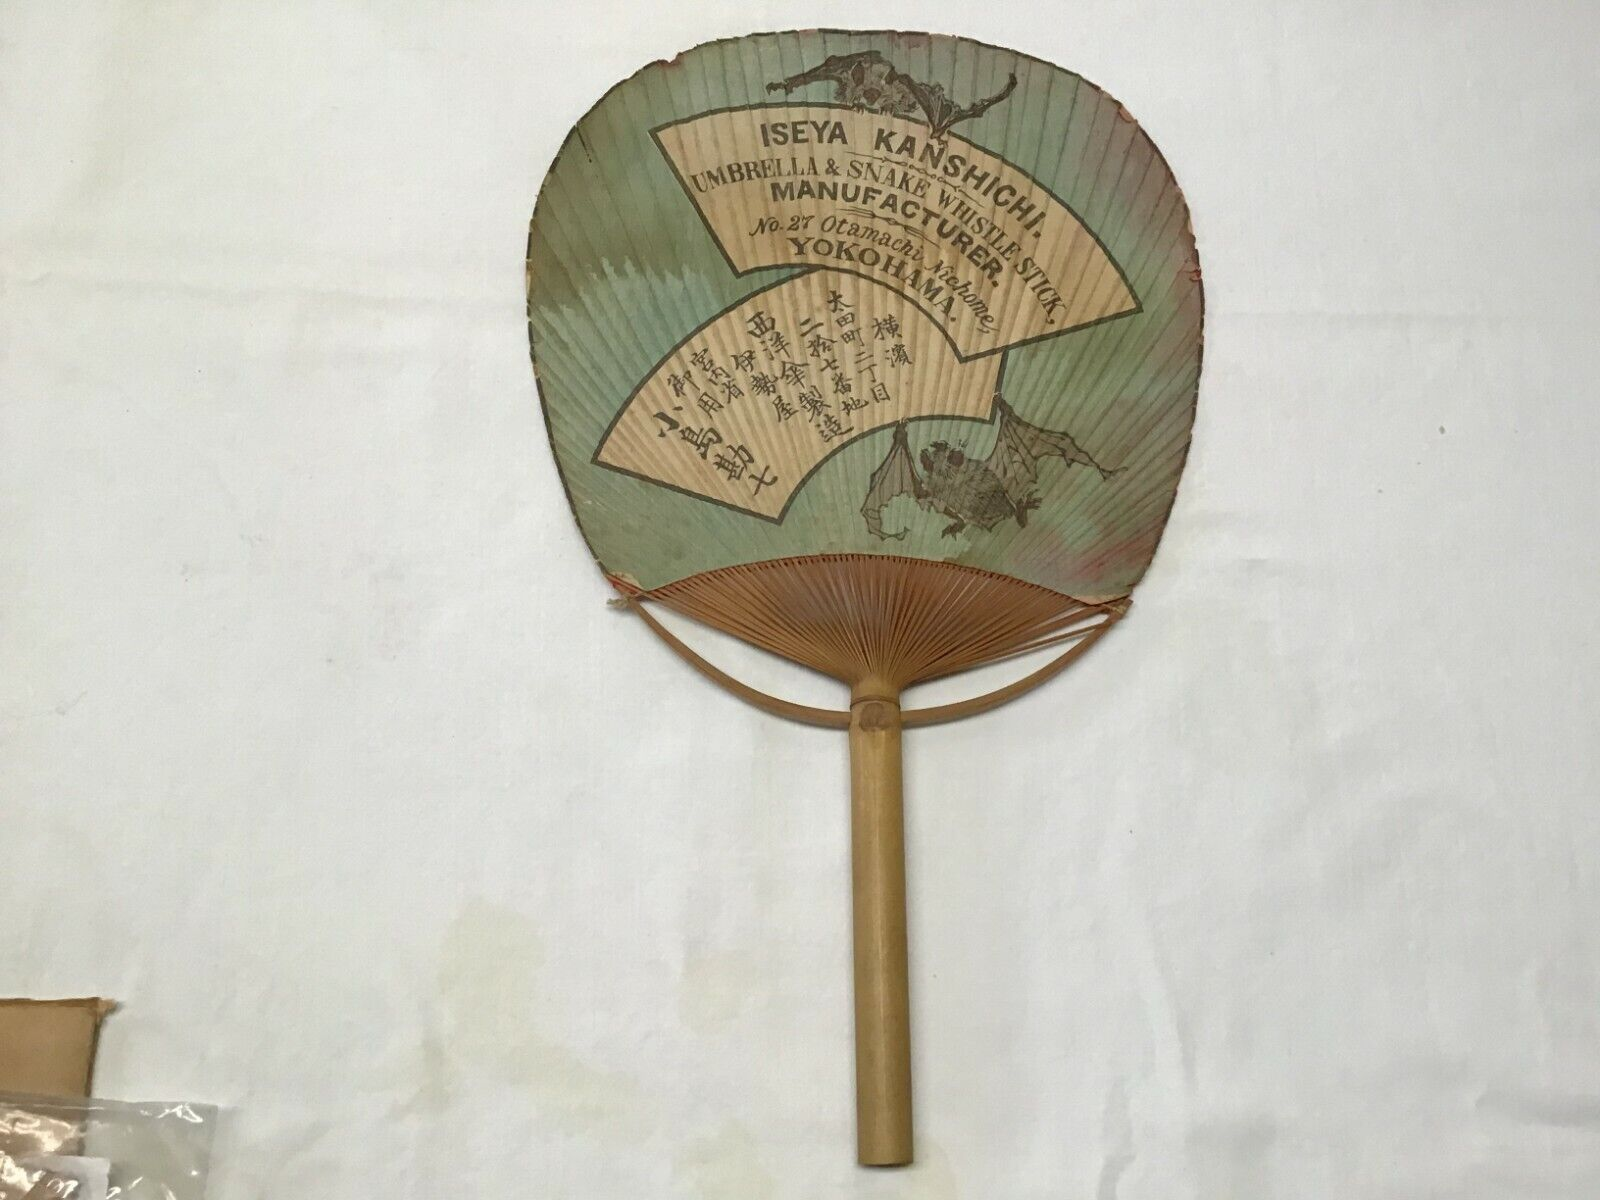 Iseya Kanshichi. Umbrella & Snake Whistle Stick, Mfg. No.27 Otamachi Nichome Yok